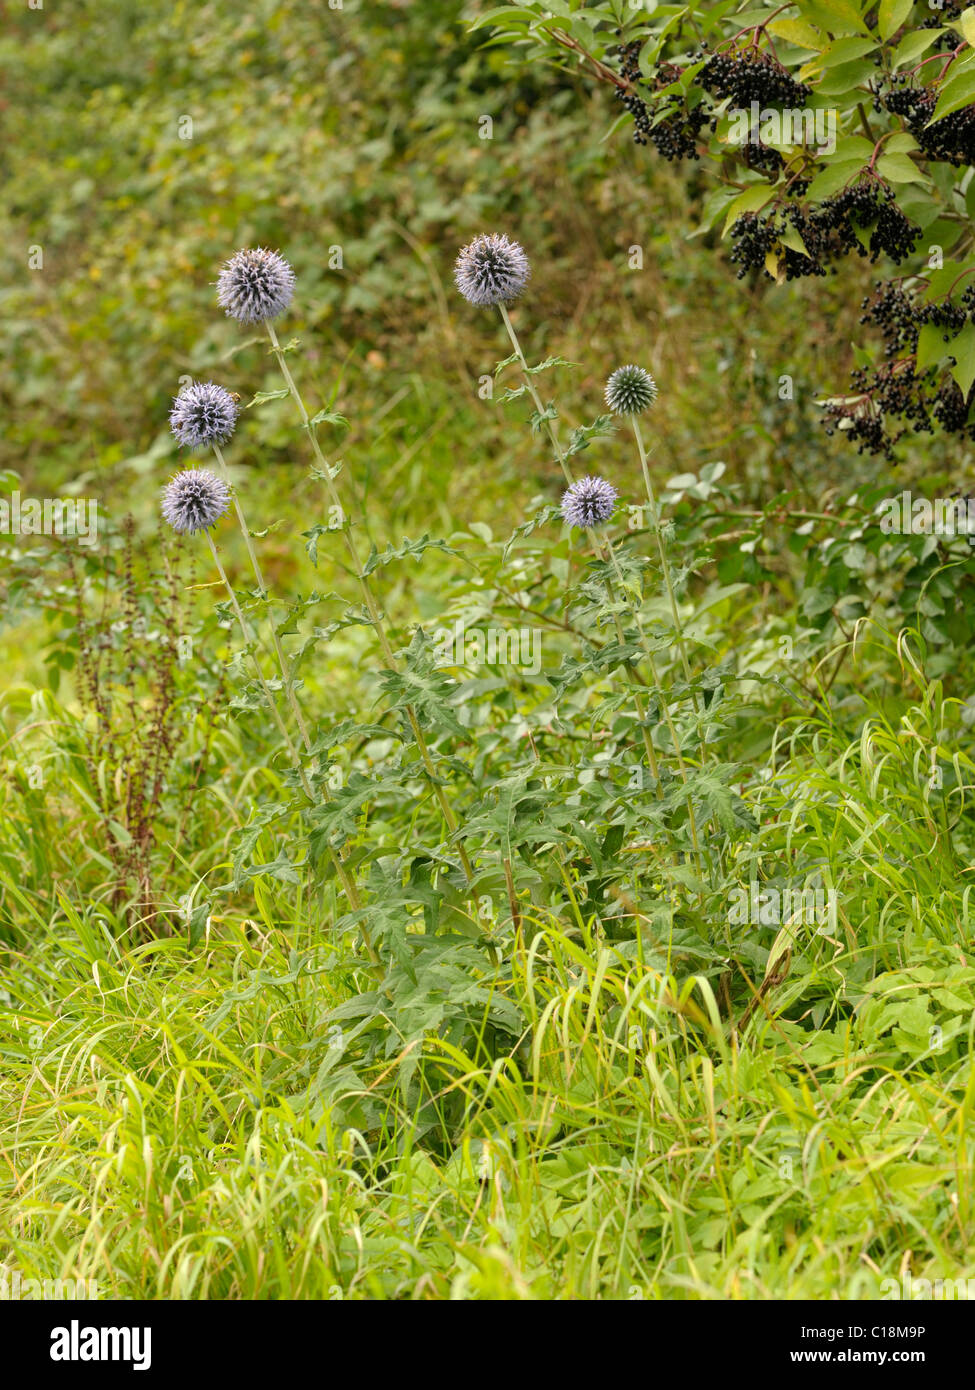 Blue Globe-thistle plant, echinops bannaticus - Stock Image